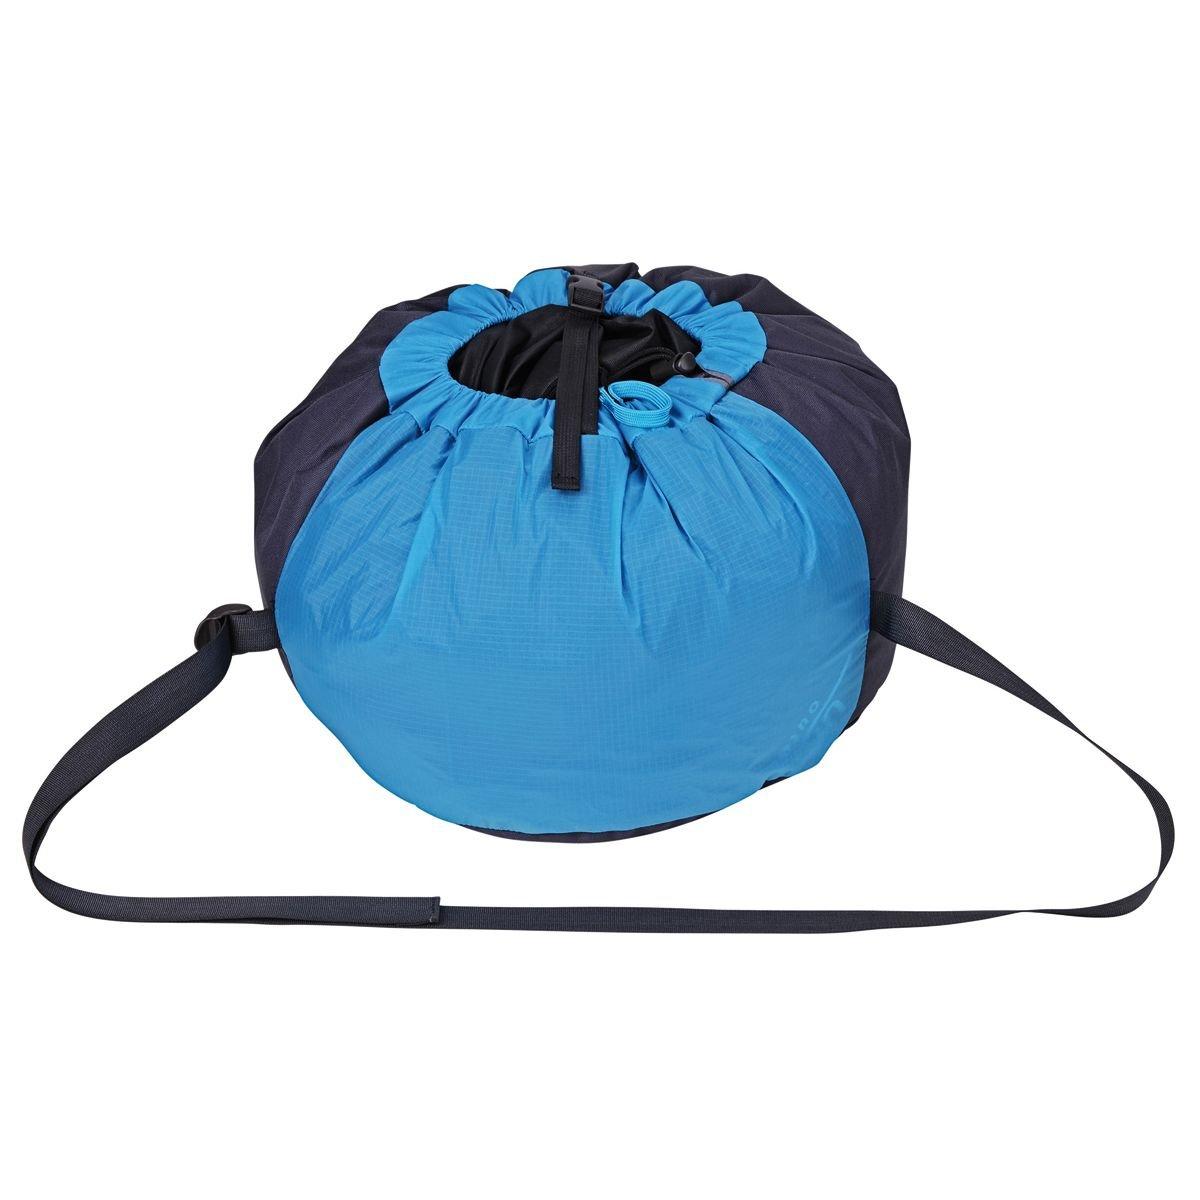 EDELRID Caddy Lite Ropebag - Icemint